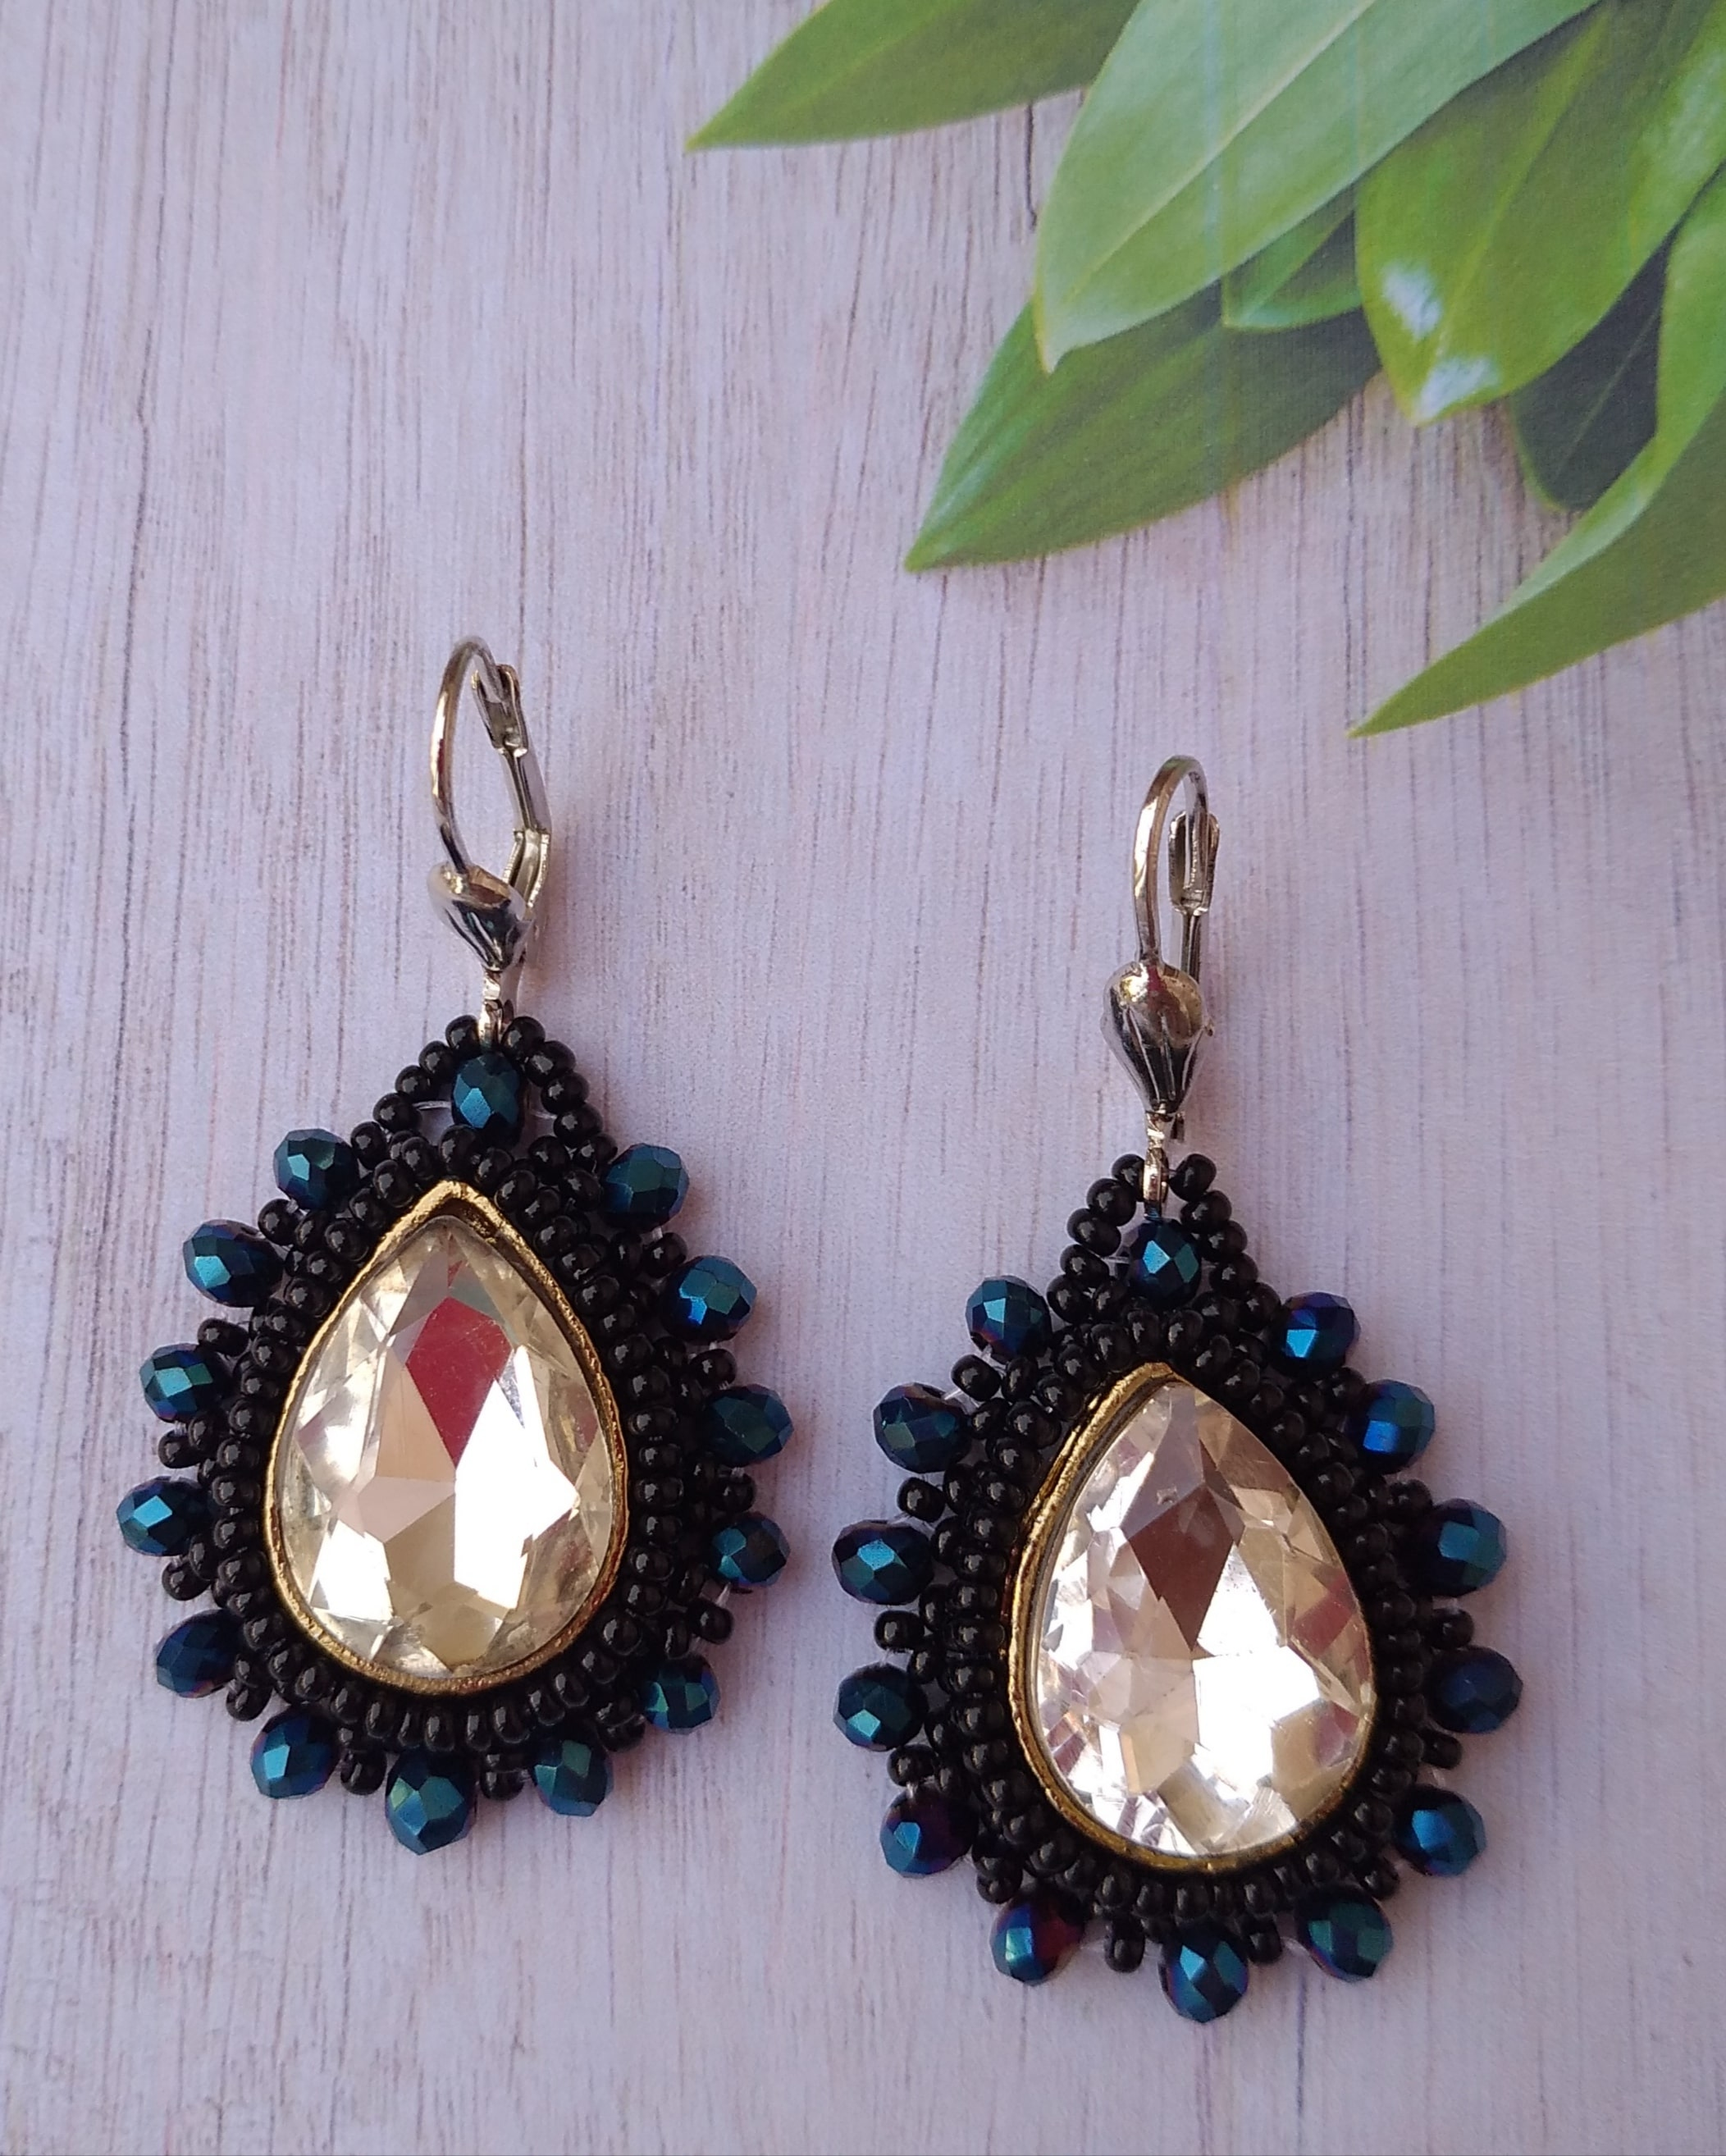 Women's Beaded Drop Earrings with Glittering Stone Work Slider Thumbnail 2/4